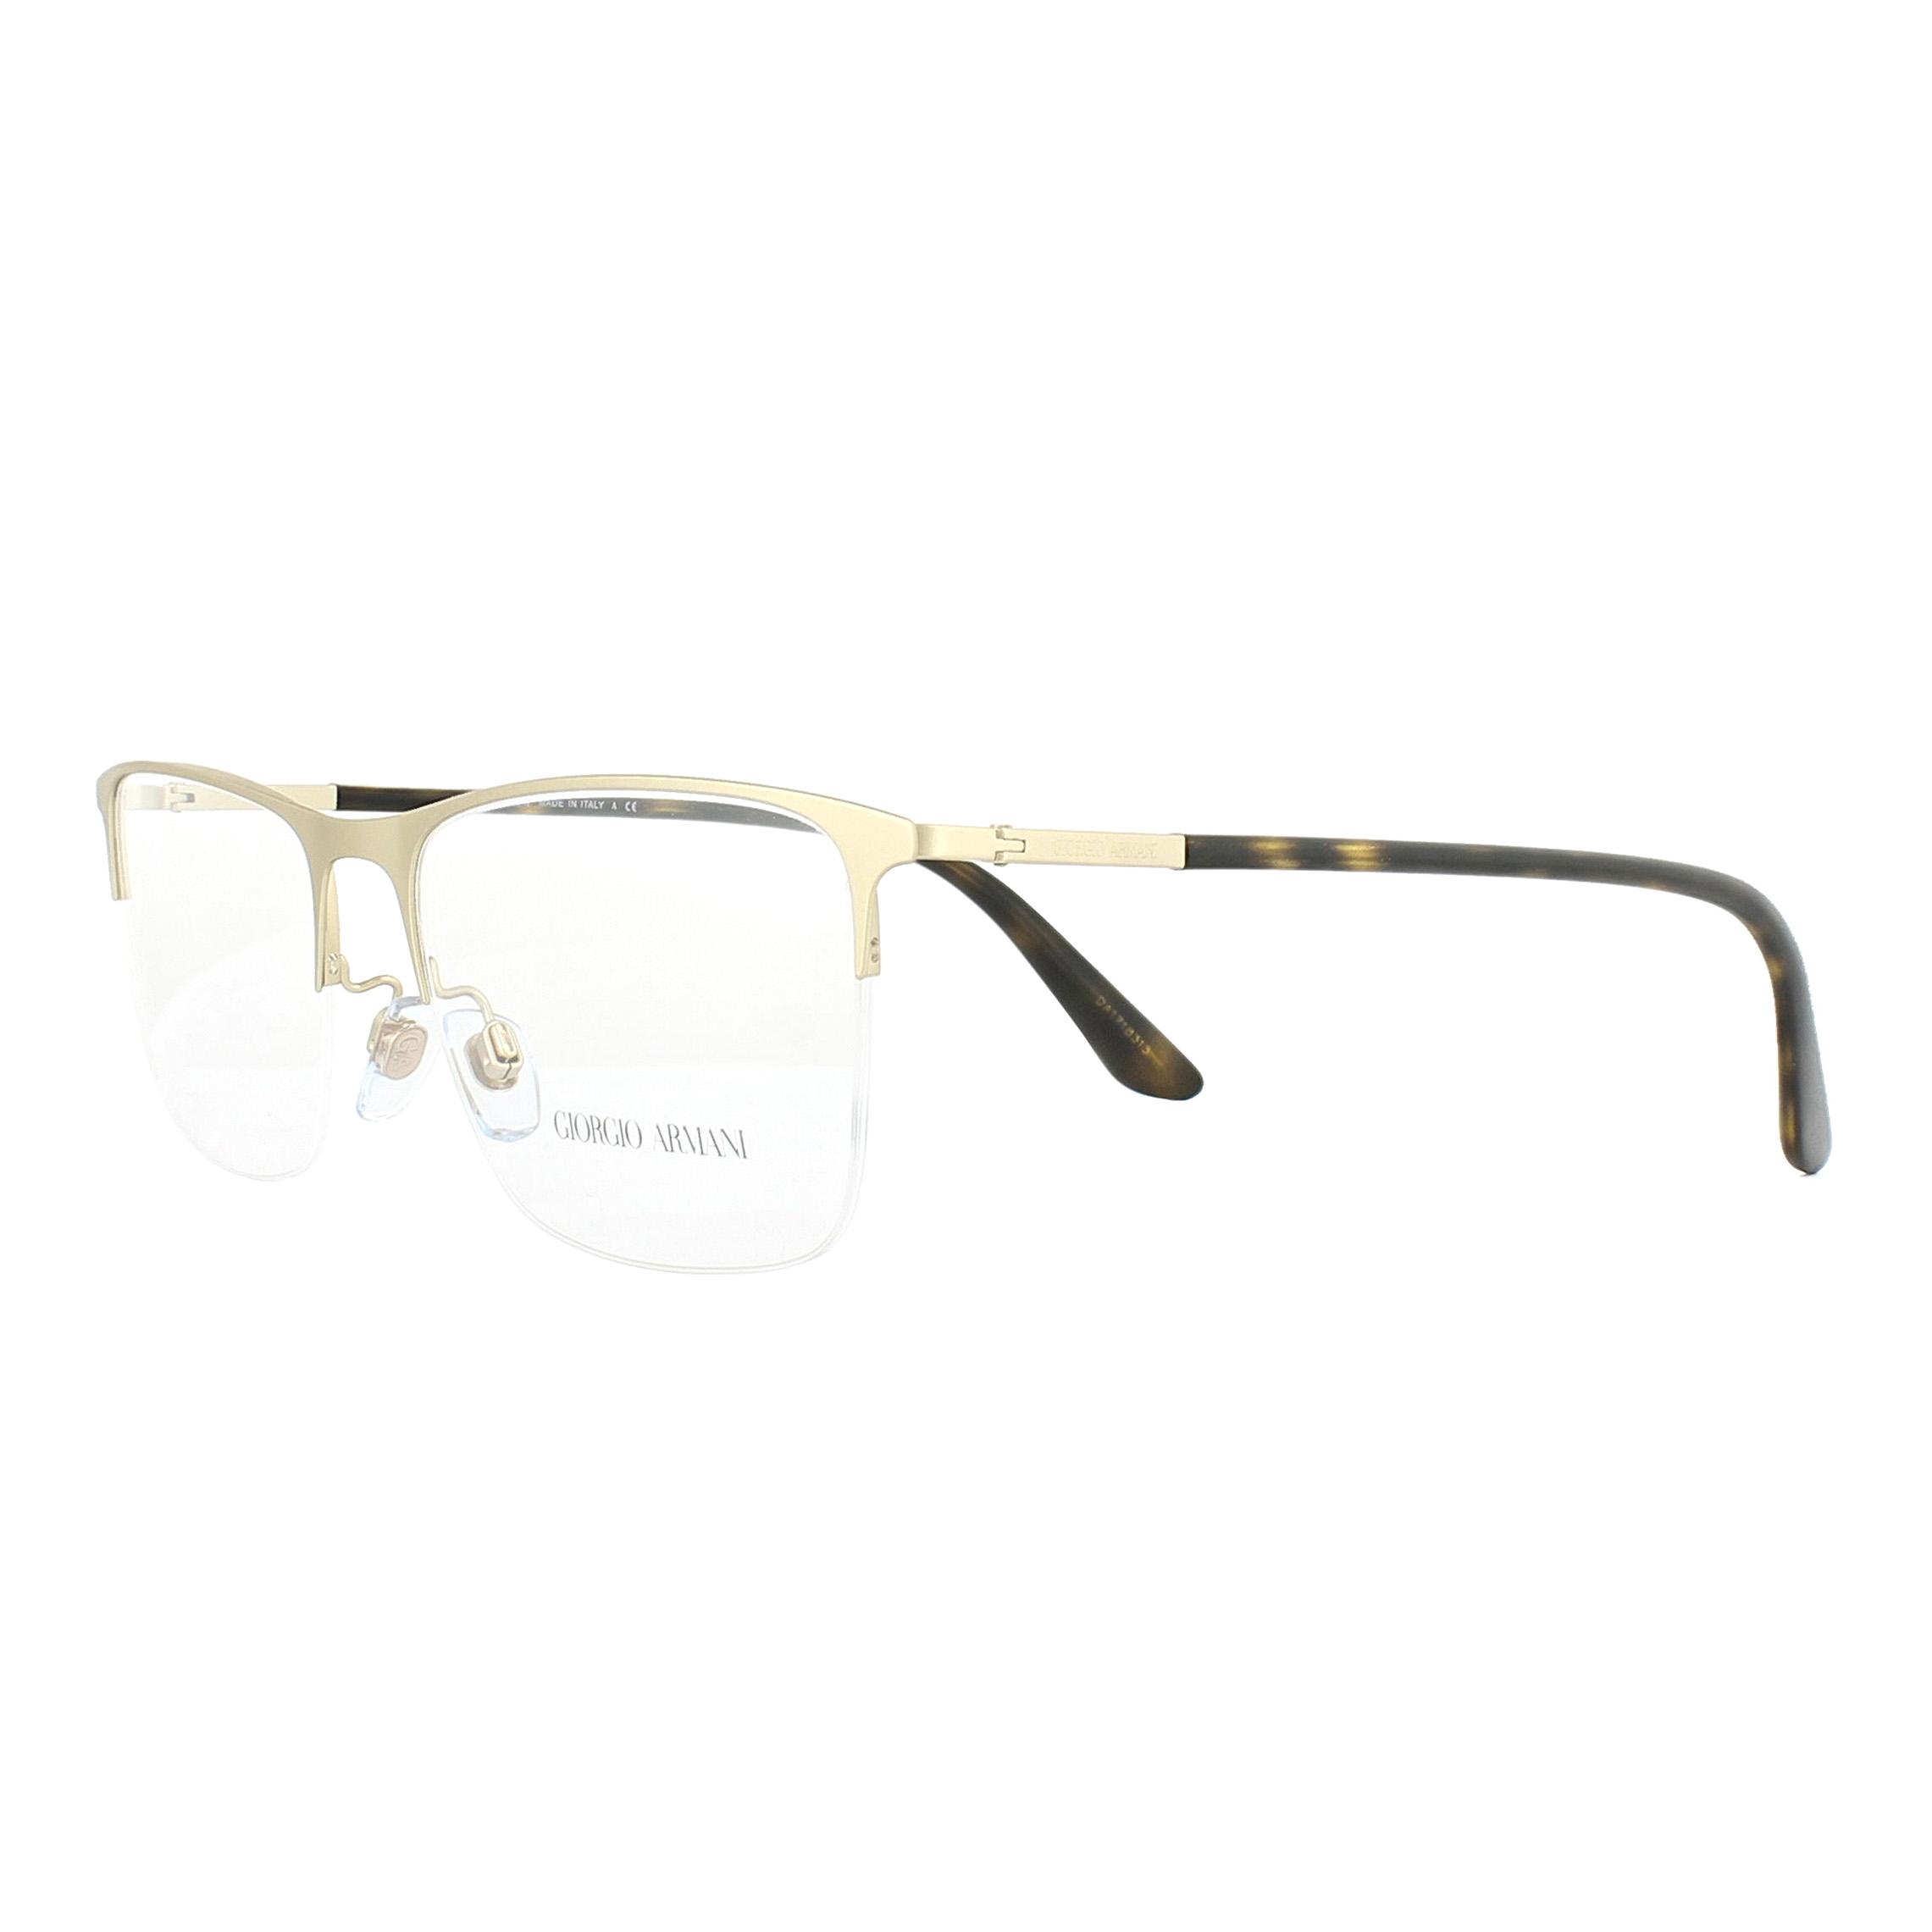 8bafe4517b5f Sentinel Giorgio Armani Glasses Frames AR5072 3002 Pale Gold 55mm Mens